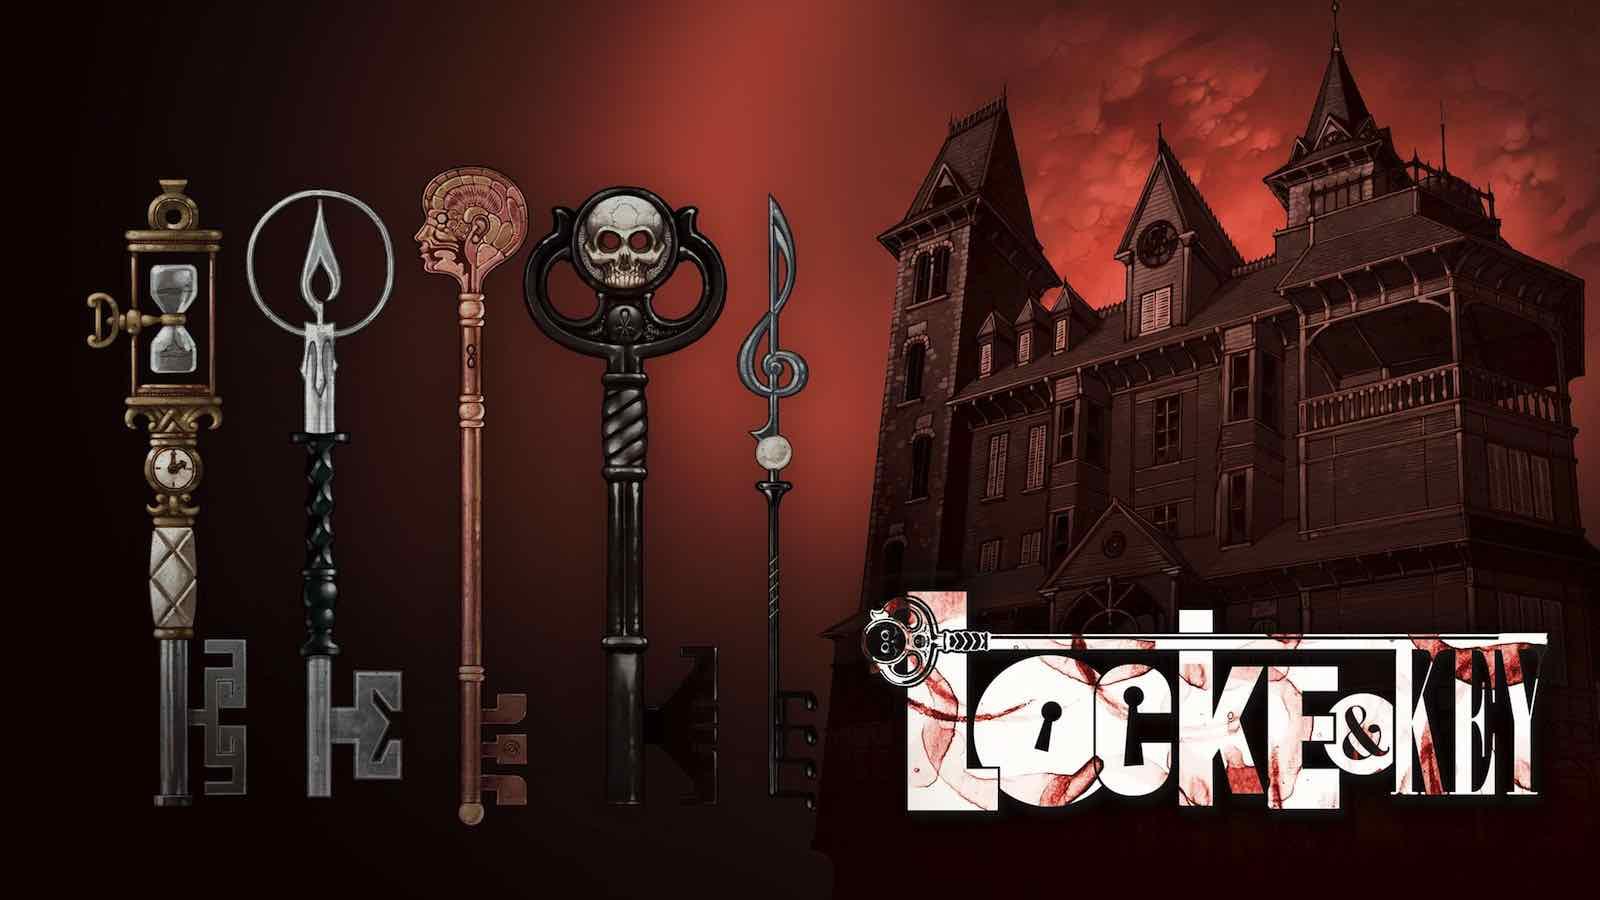 locke-and-key-5.jpg